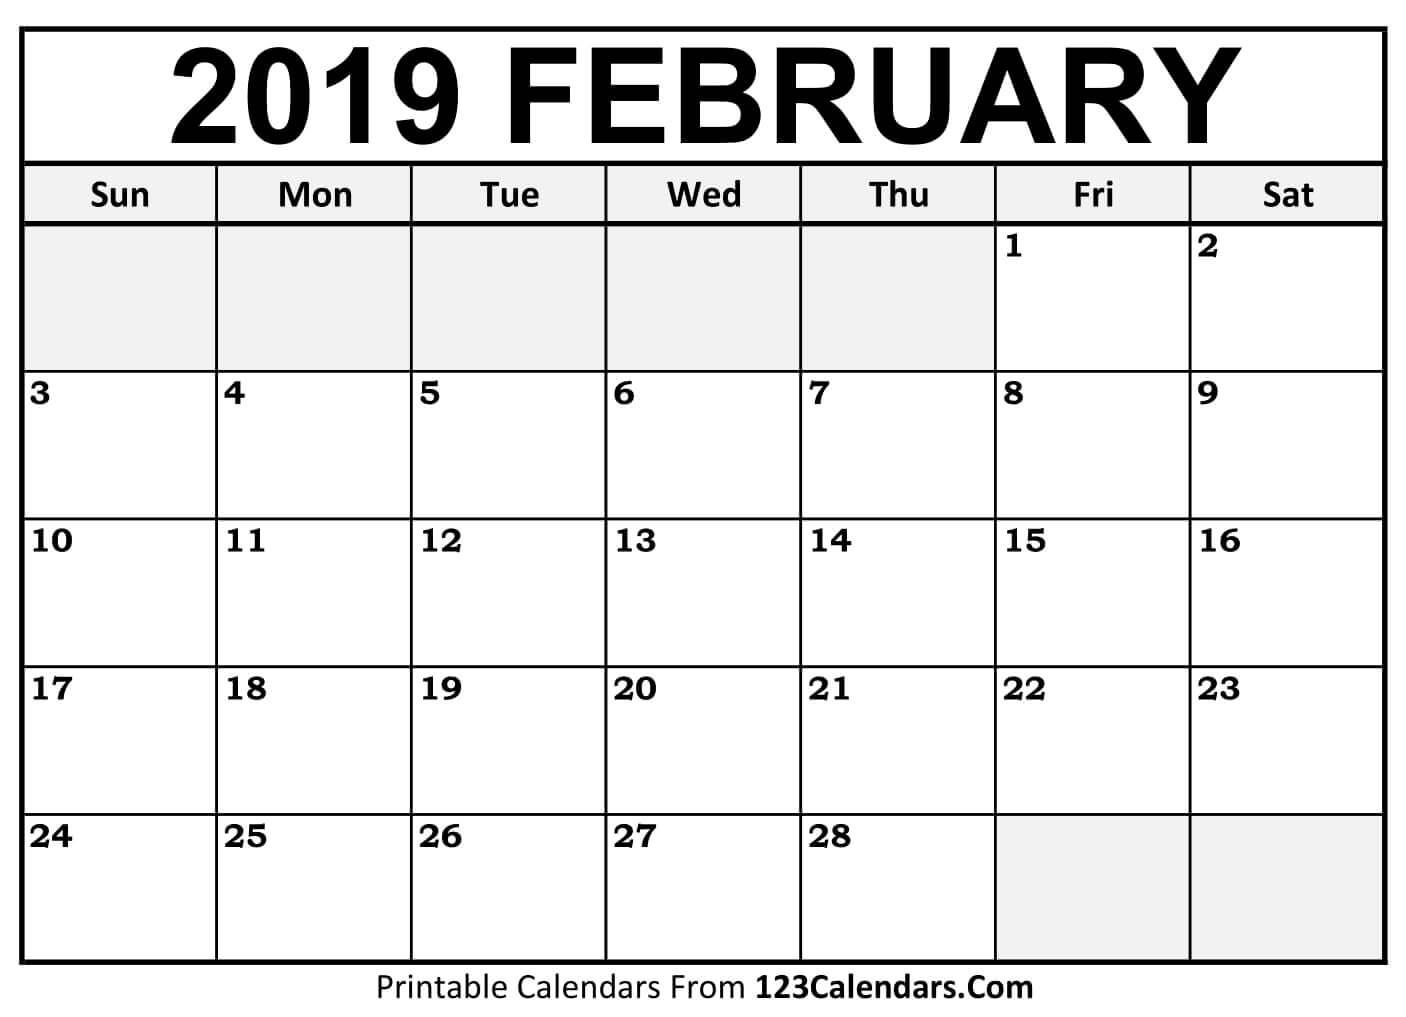 Calendar February 2019.